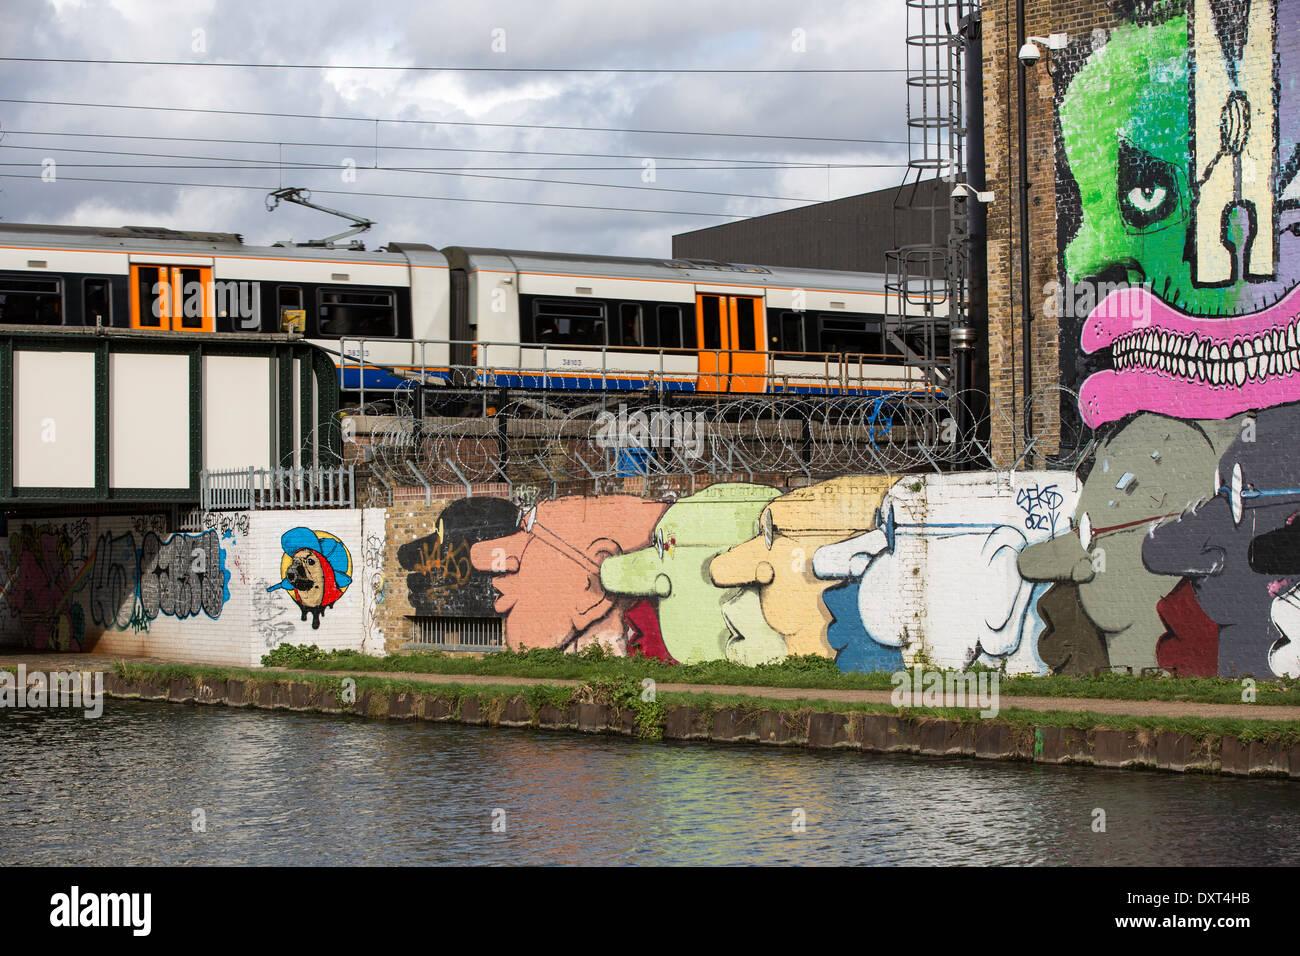 Graffiti on the wall along the Lee River Navigation, Hackney, E9, London, United Kingdom - Stock Image